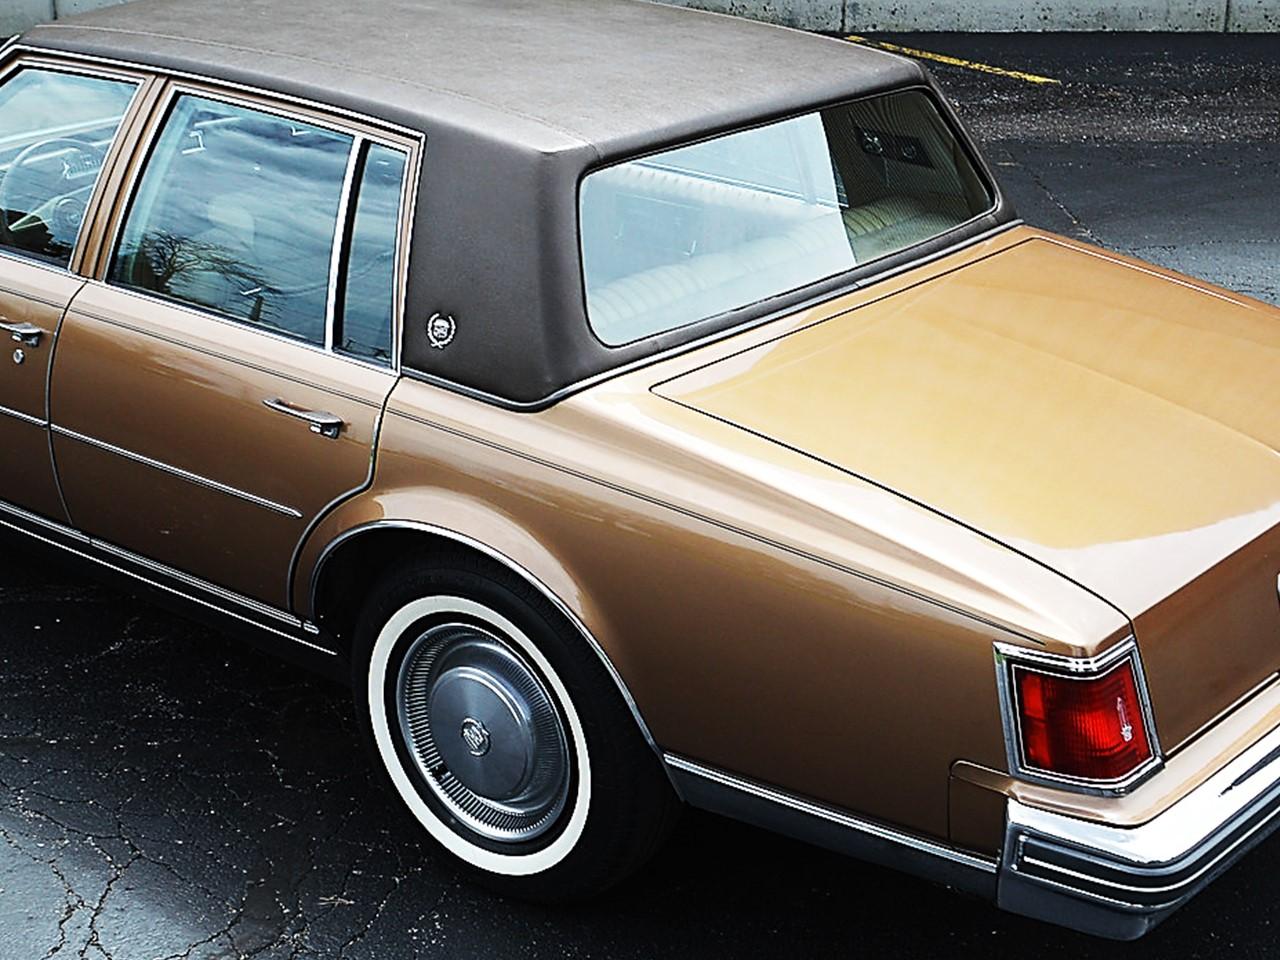 1976 Cadillac Seville 2